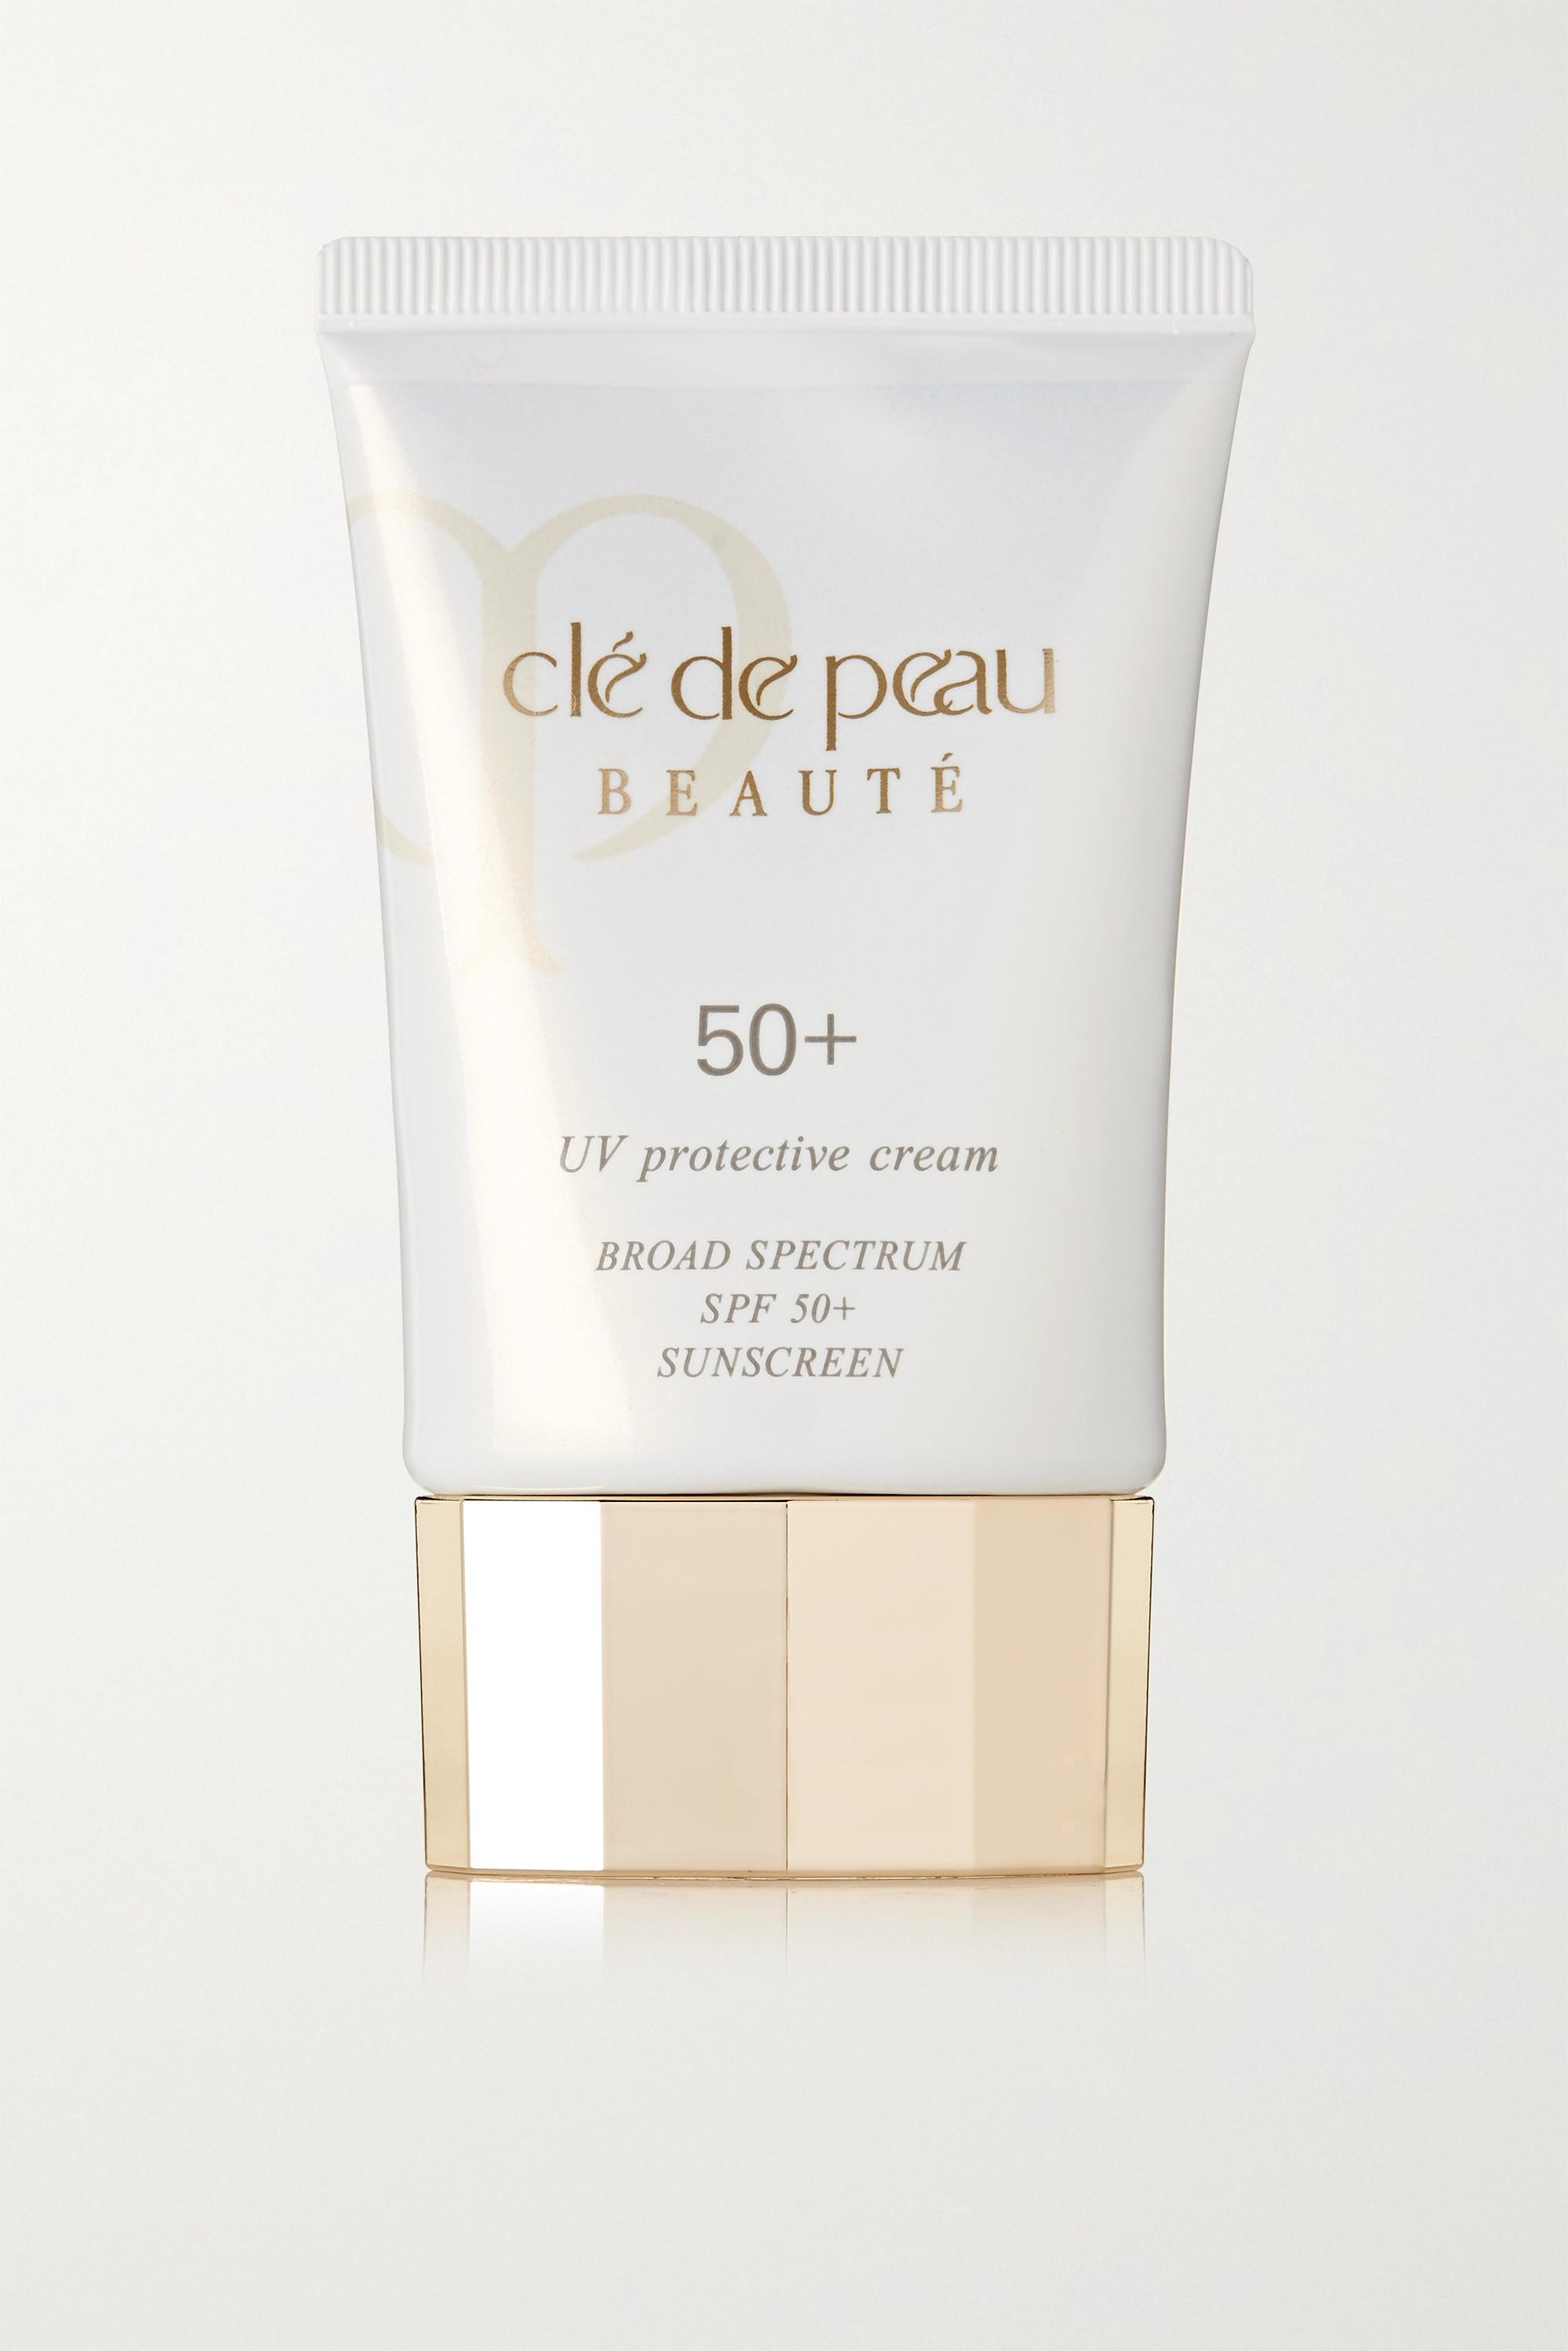 Clé de Peau Beauté UV Protective Cream SPF50+, 50ml